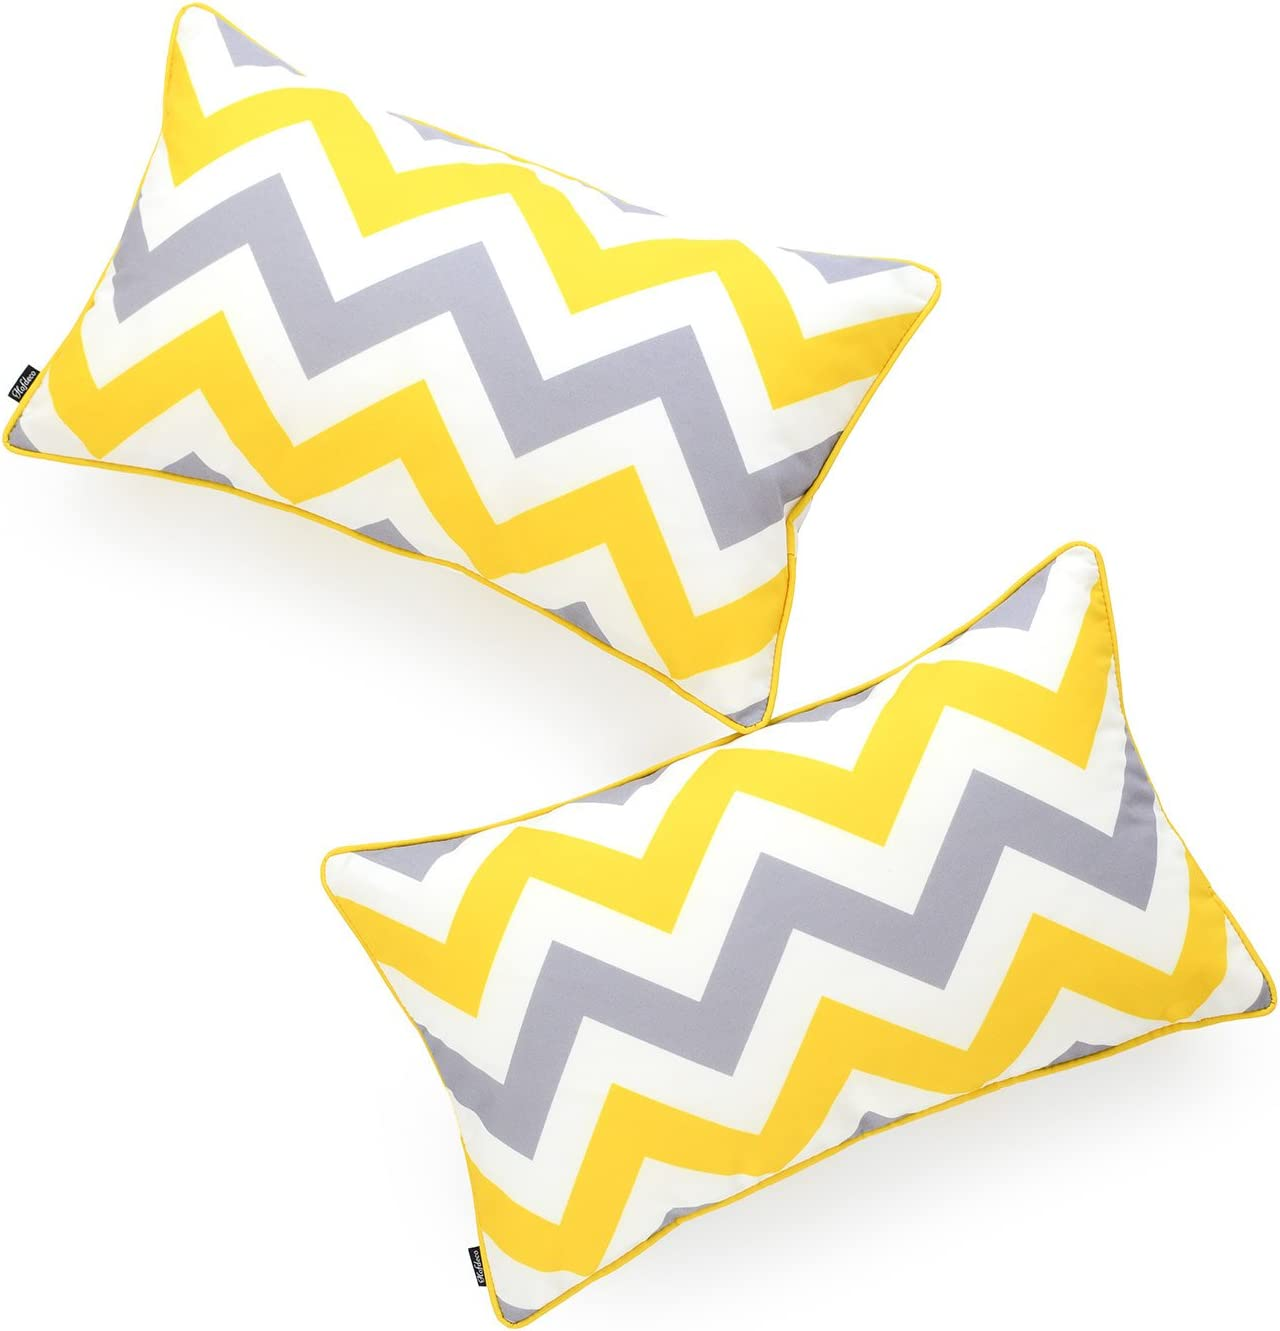 "Hofdeco Indoor Outdoor Lumbar Pillow Cover ONLY, Water Resistant for Patio Lounge Sofa, Yellow Gray Zigzag Chevron, 12""x20"", Set of 2"